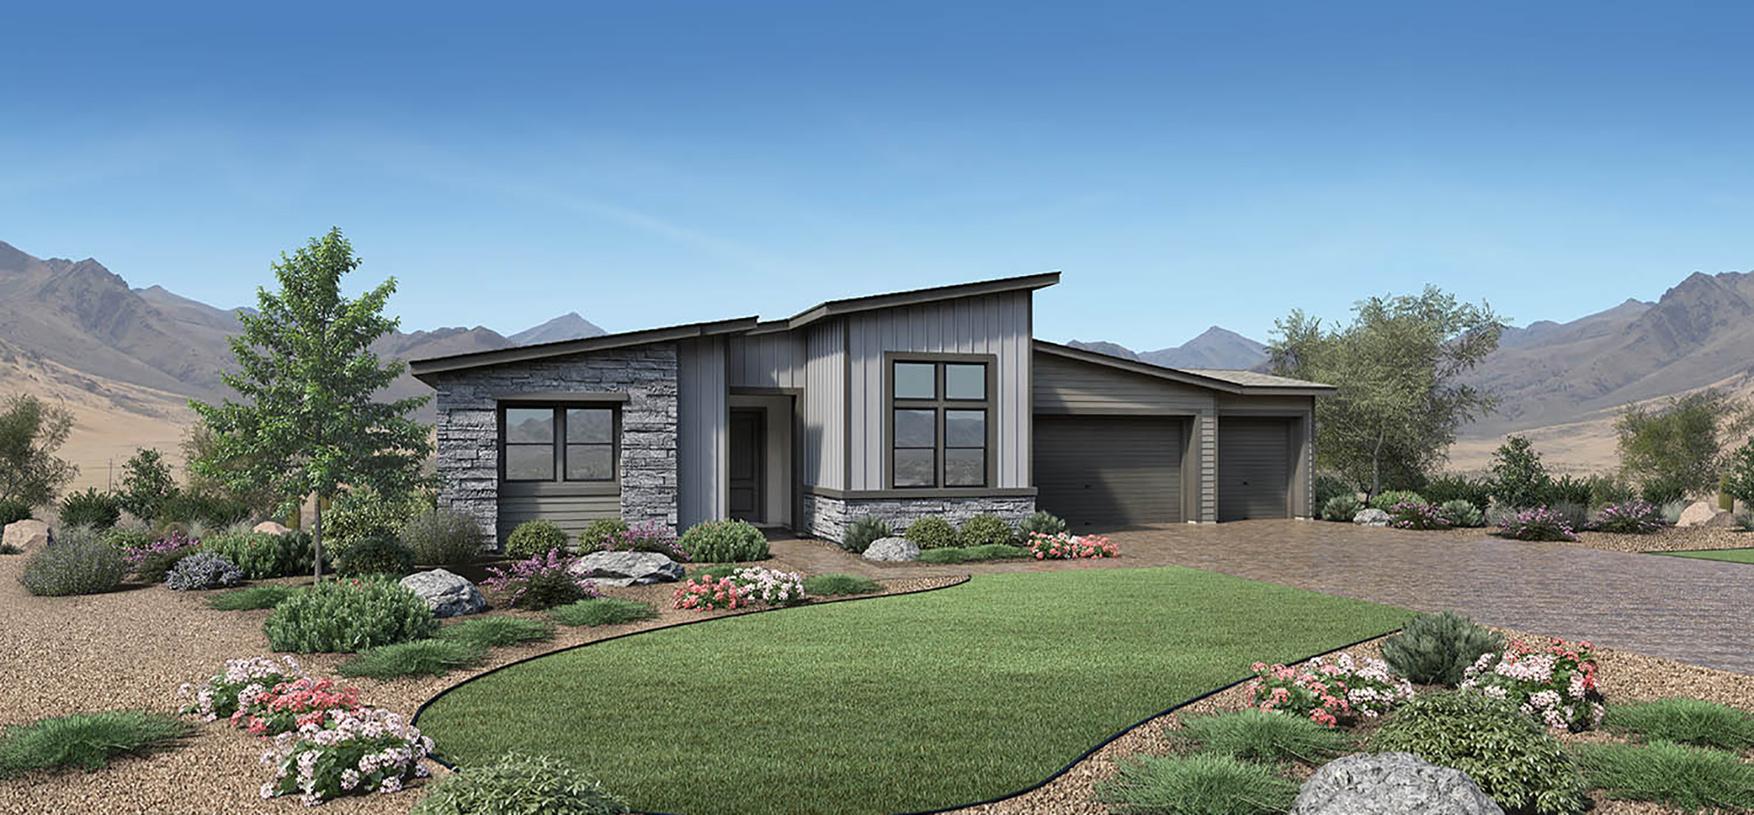 Yardley Elite -  Modern Ranch